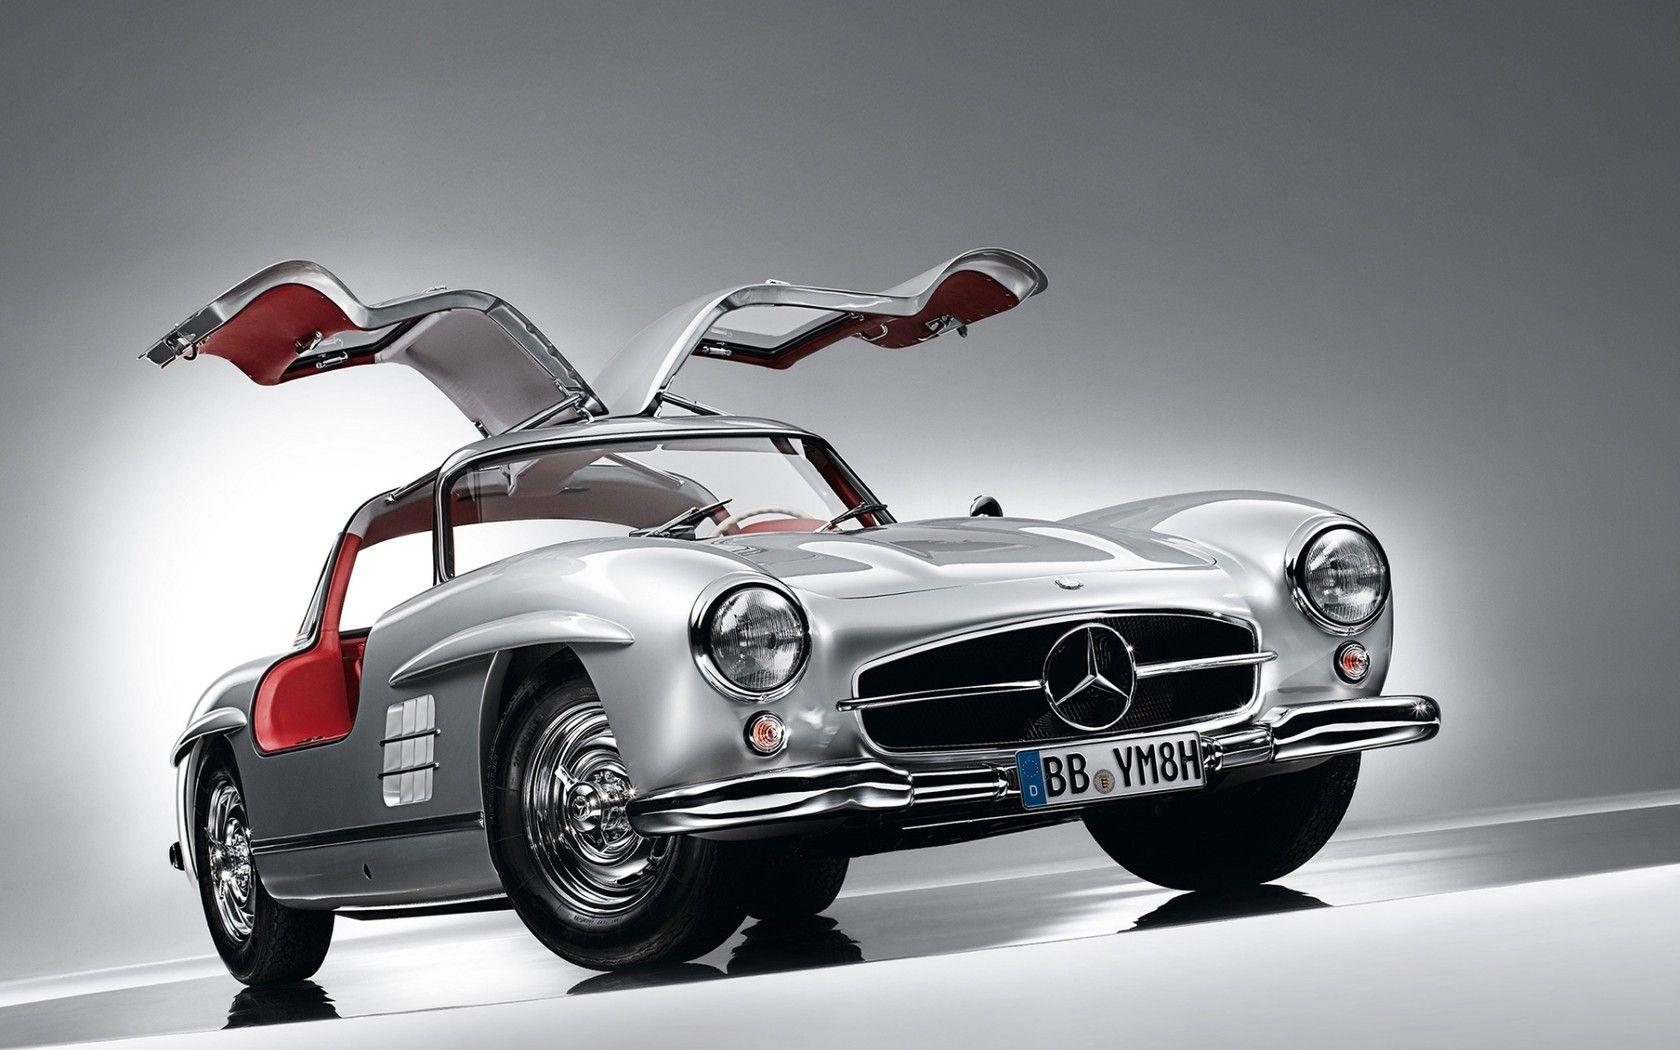 Mercedes Benz Classic Cars Butterfly Doors 1680x1050 Wallpaper Mercedes Benz 300 Benz Mercedes